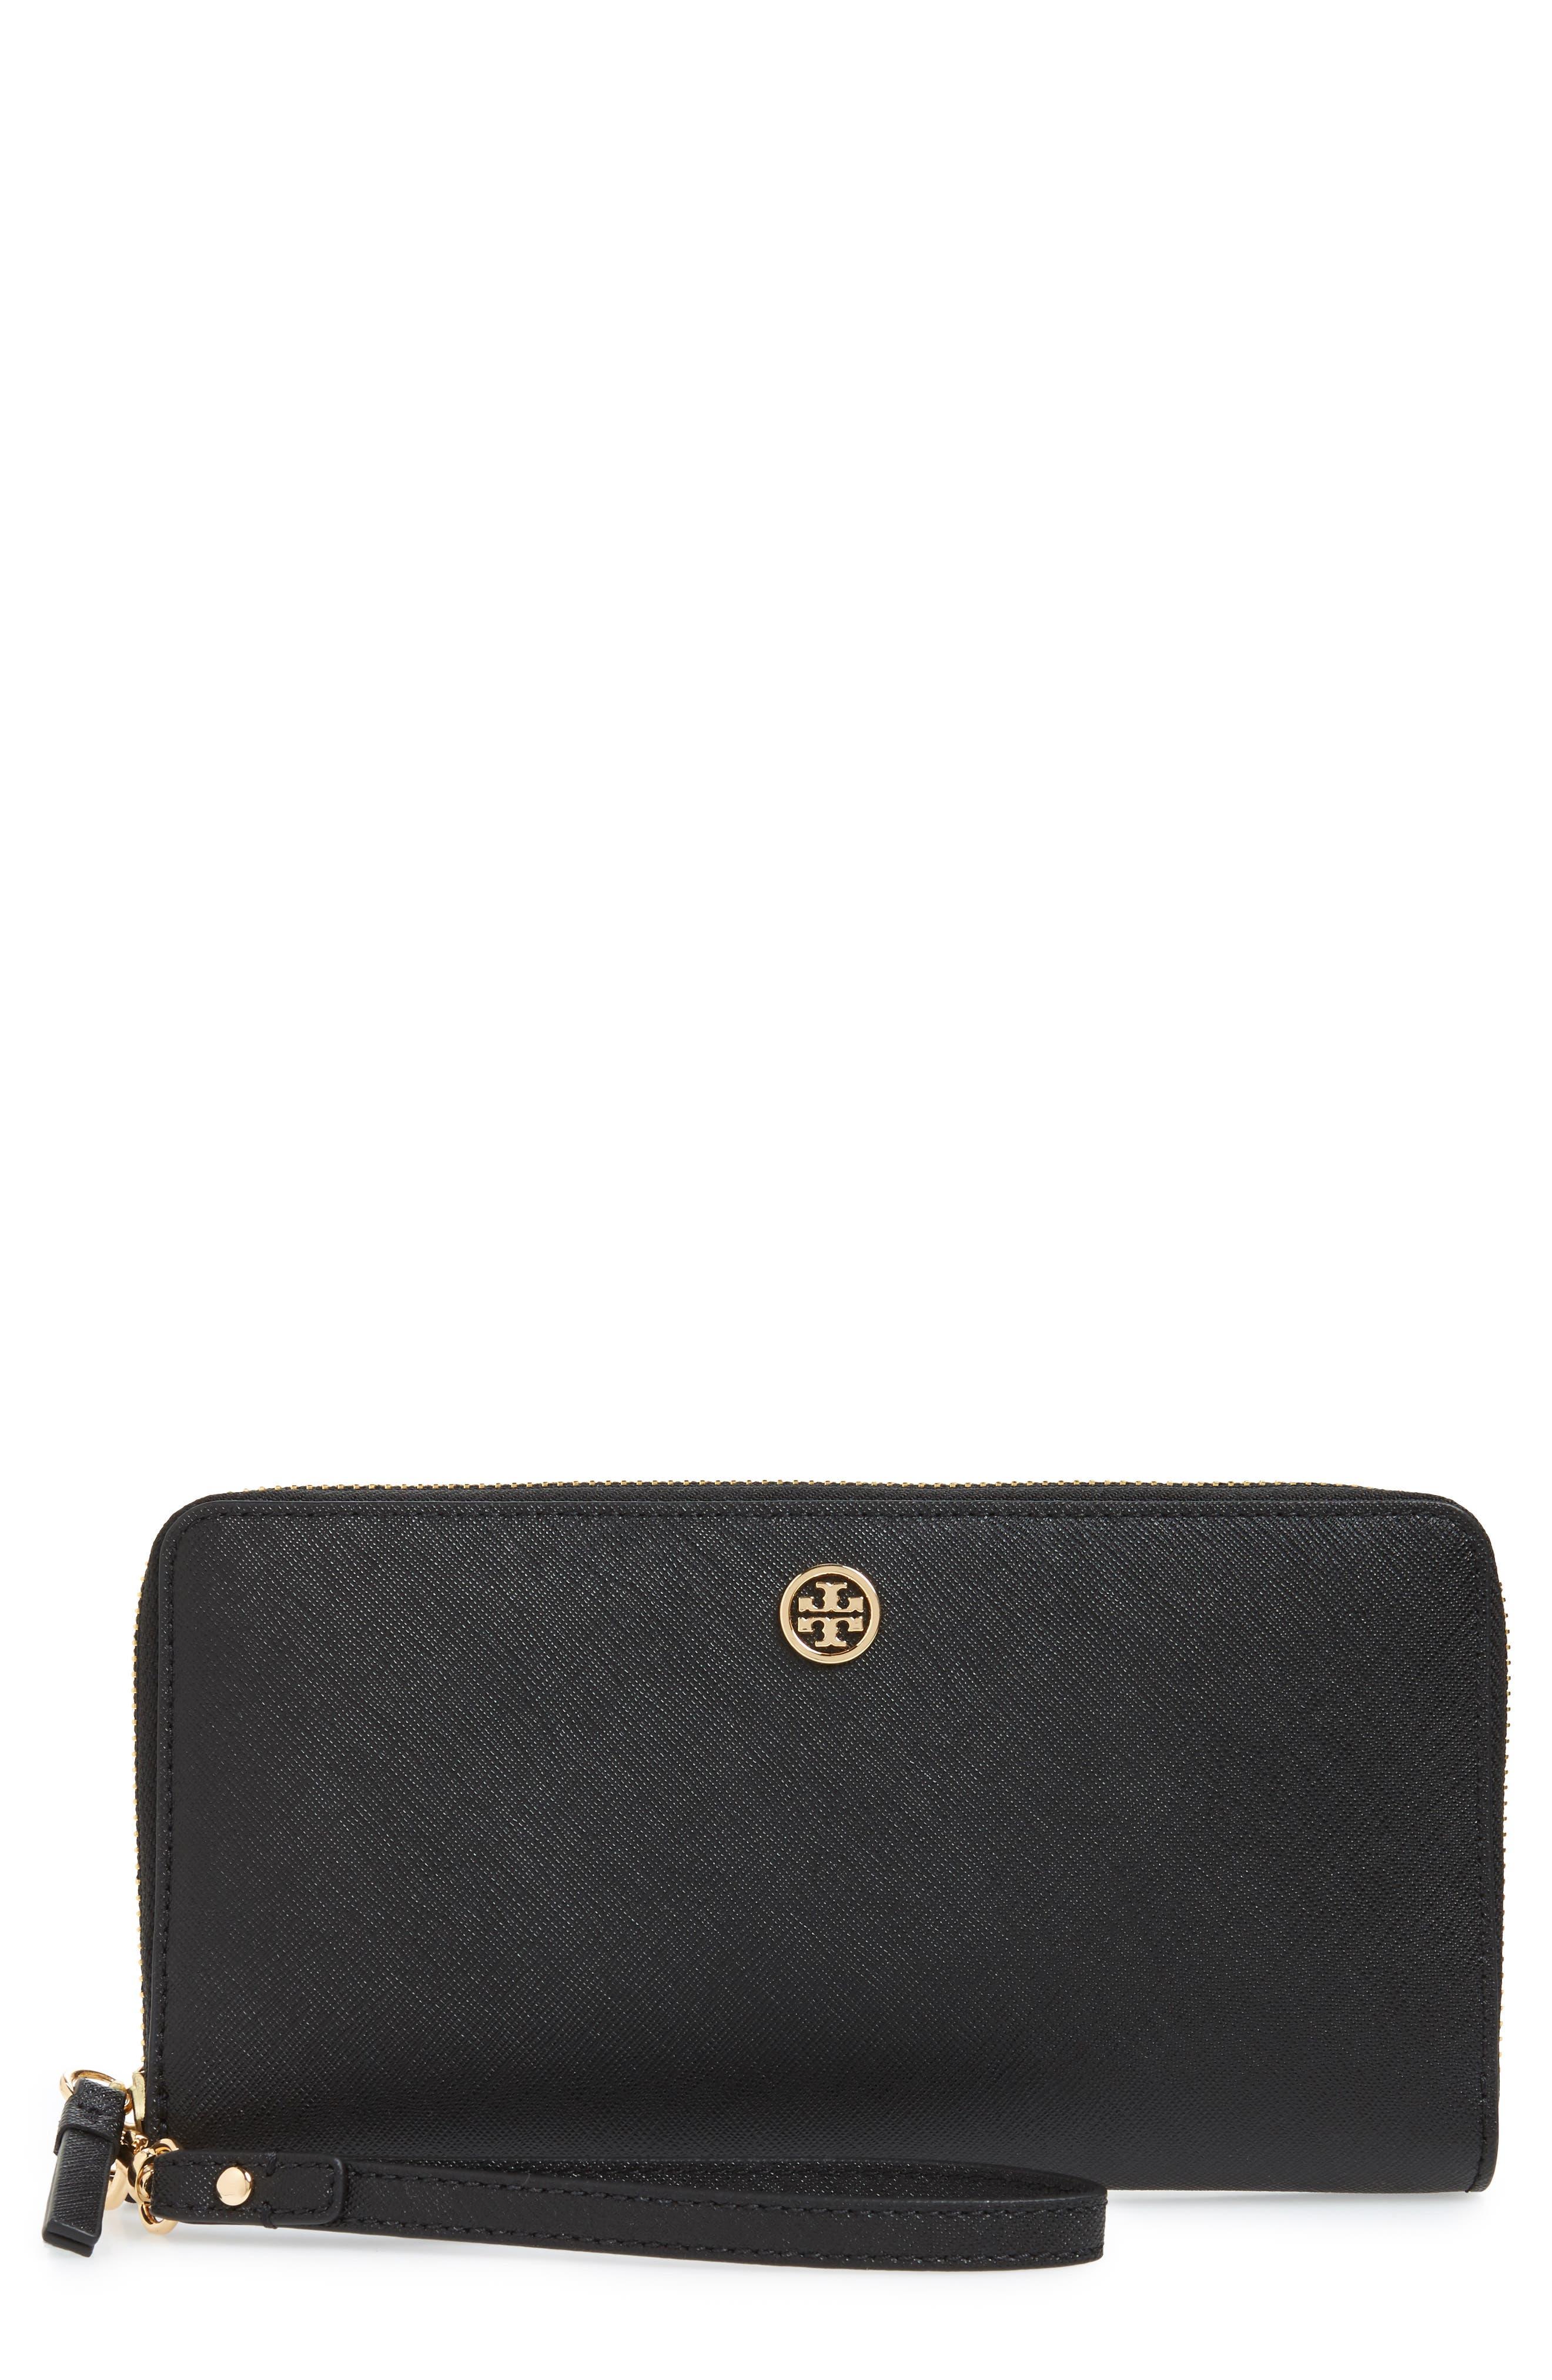 TORY BURCH, Robinson Leather Passport Continental Wallet, Main thumbnail 1, color, BLACK / ROYAL NAVY